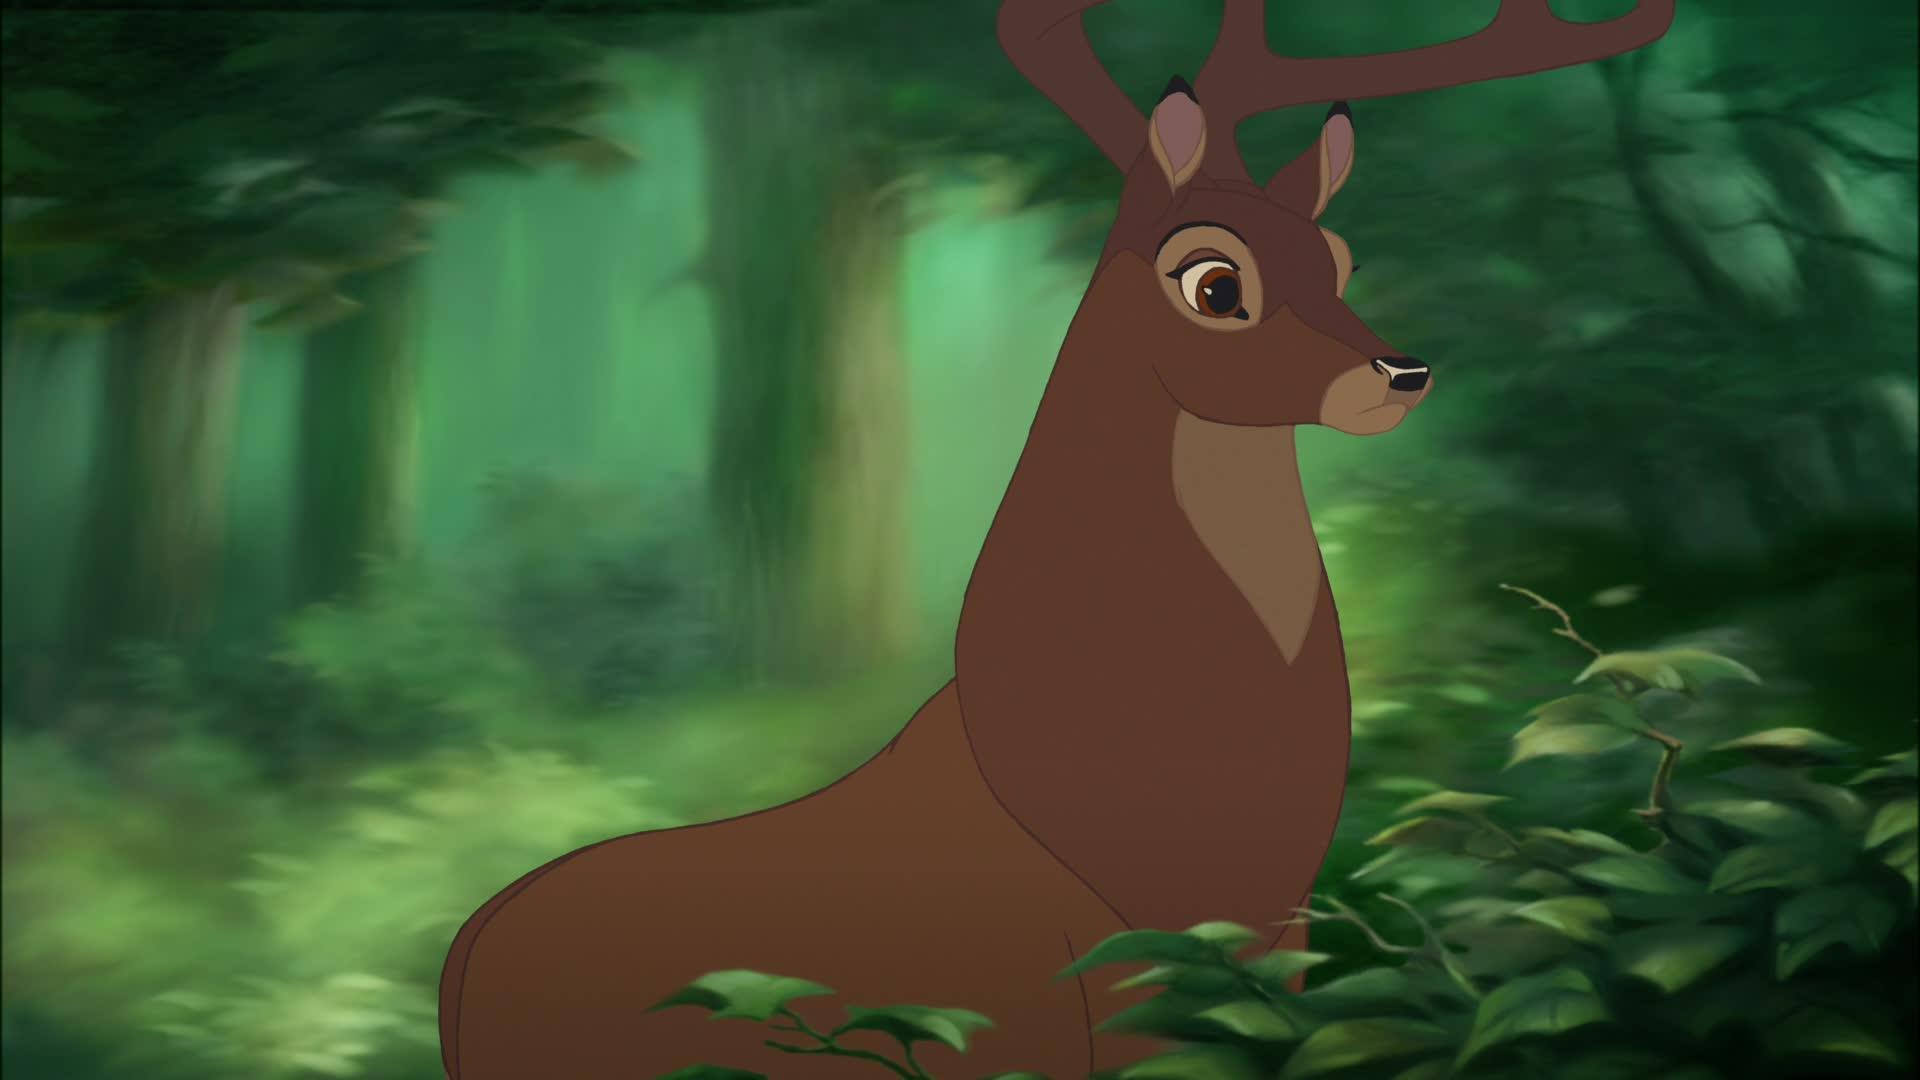 twitterpated bambi disney quotes quotesgram